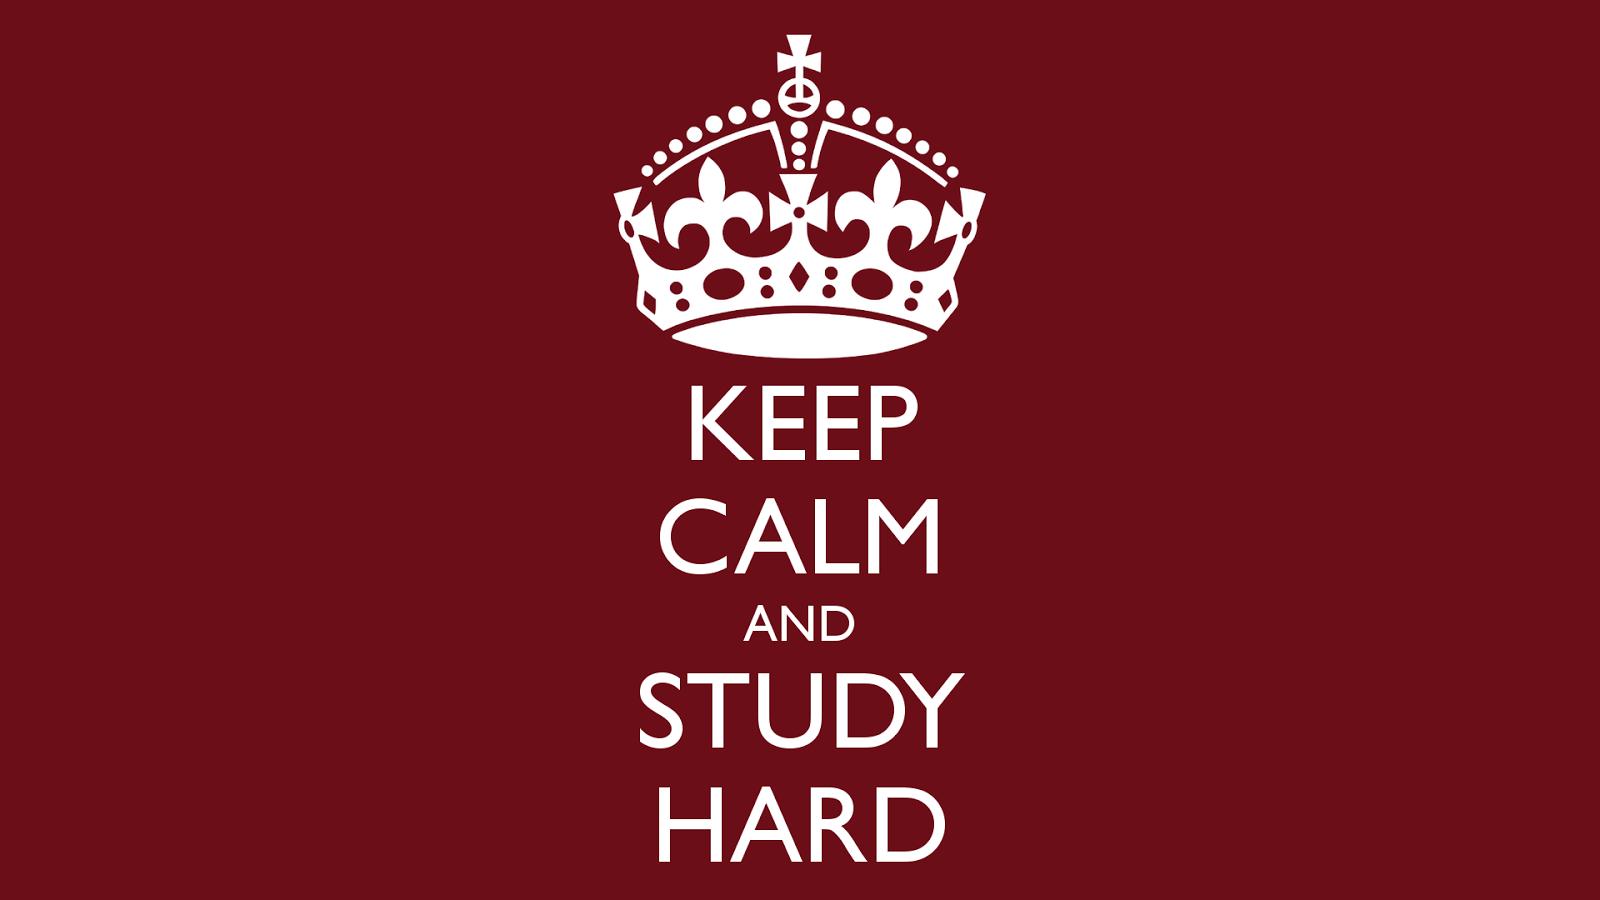 Keep Studying Wallpaper O-matic.co.uk/p/keep-calm